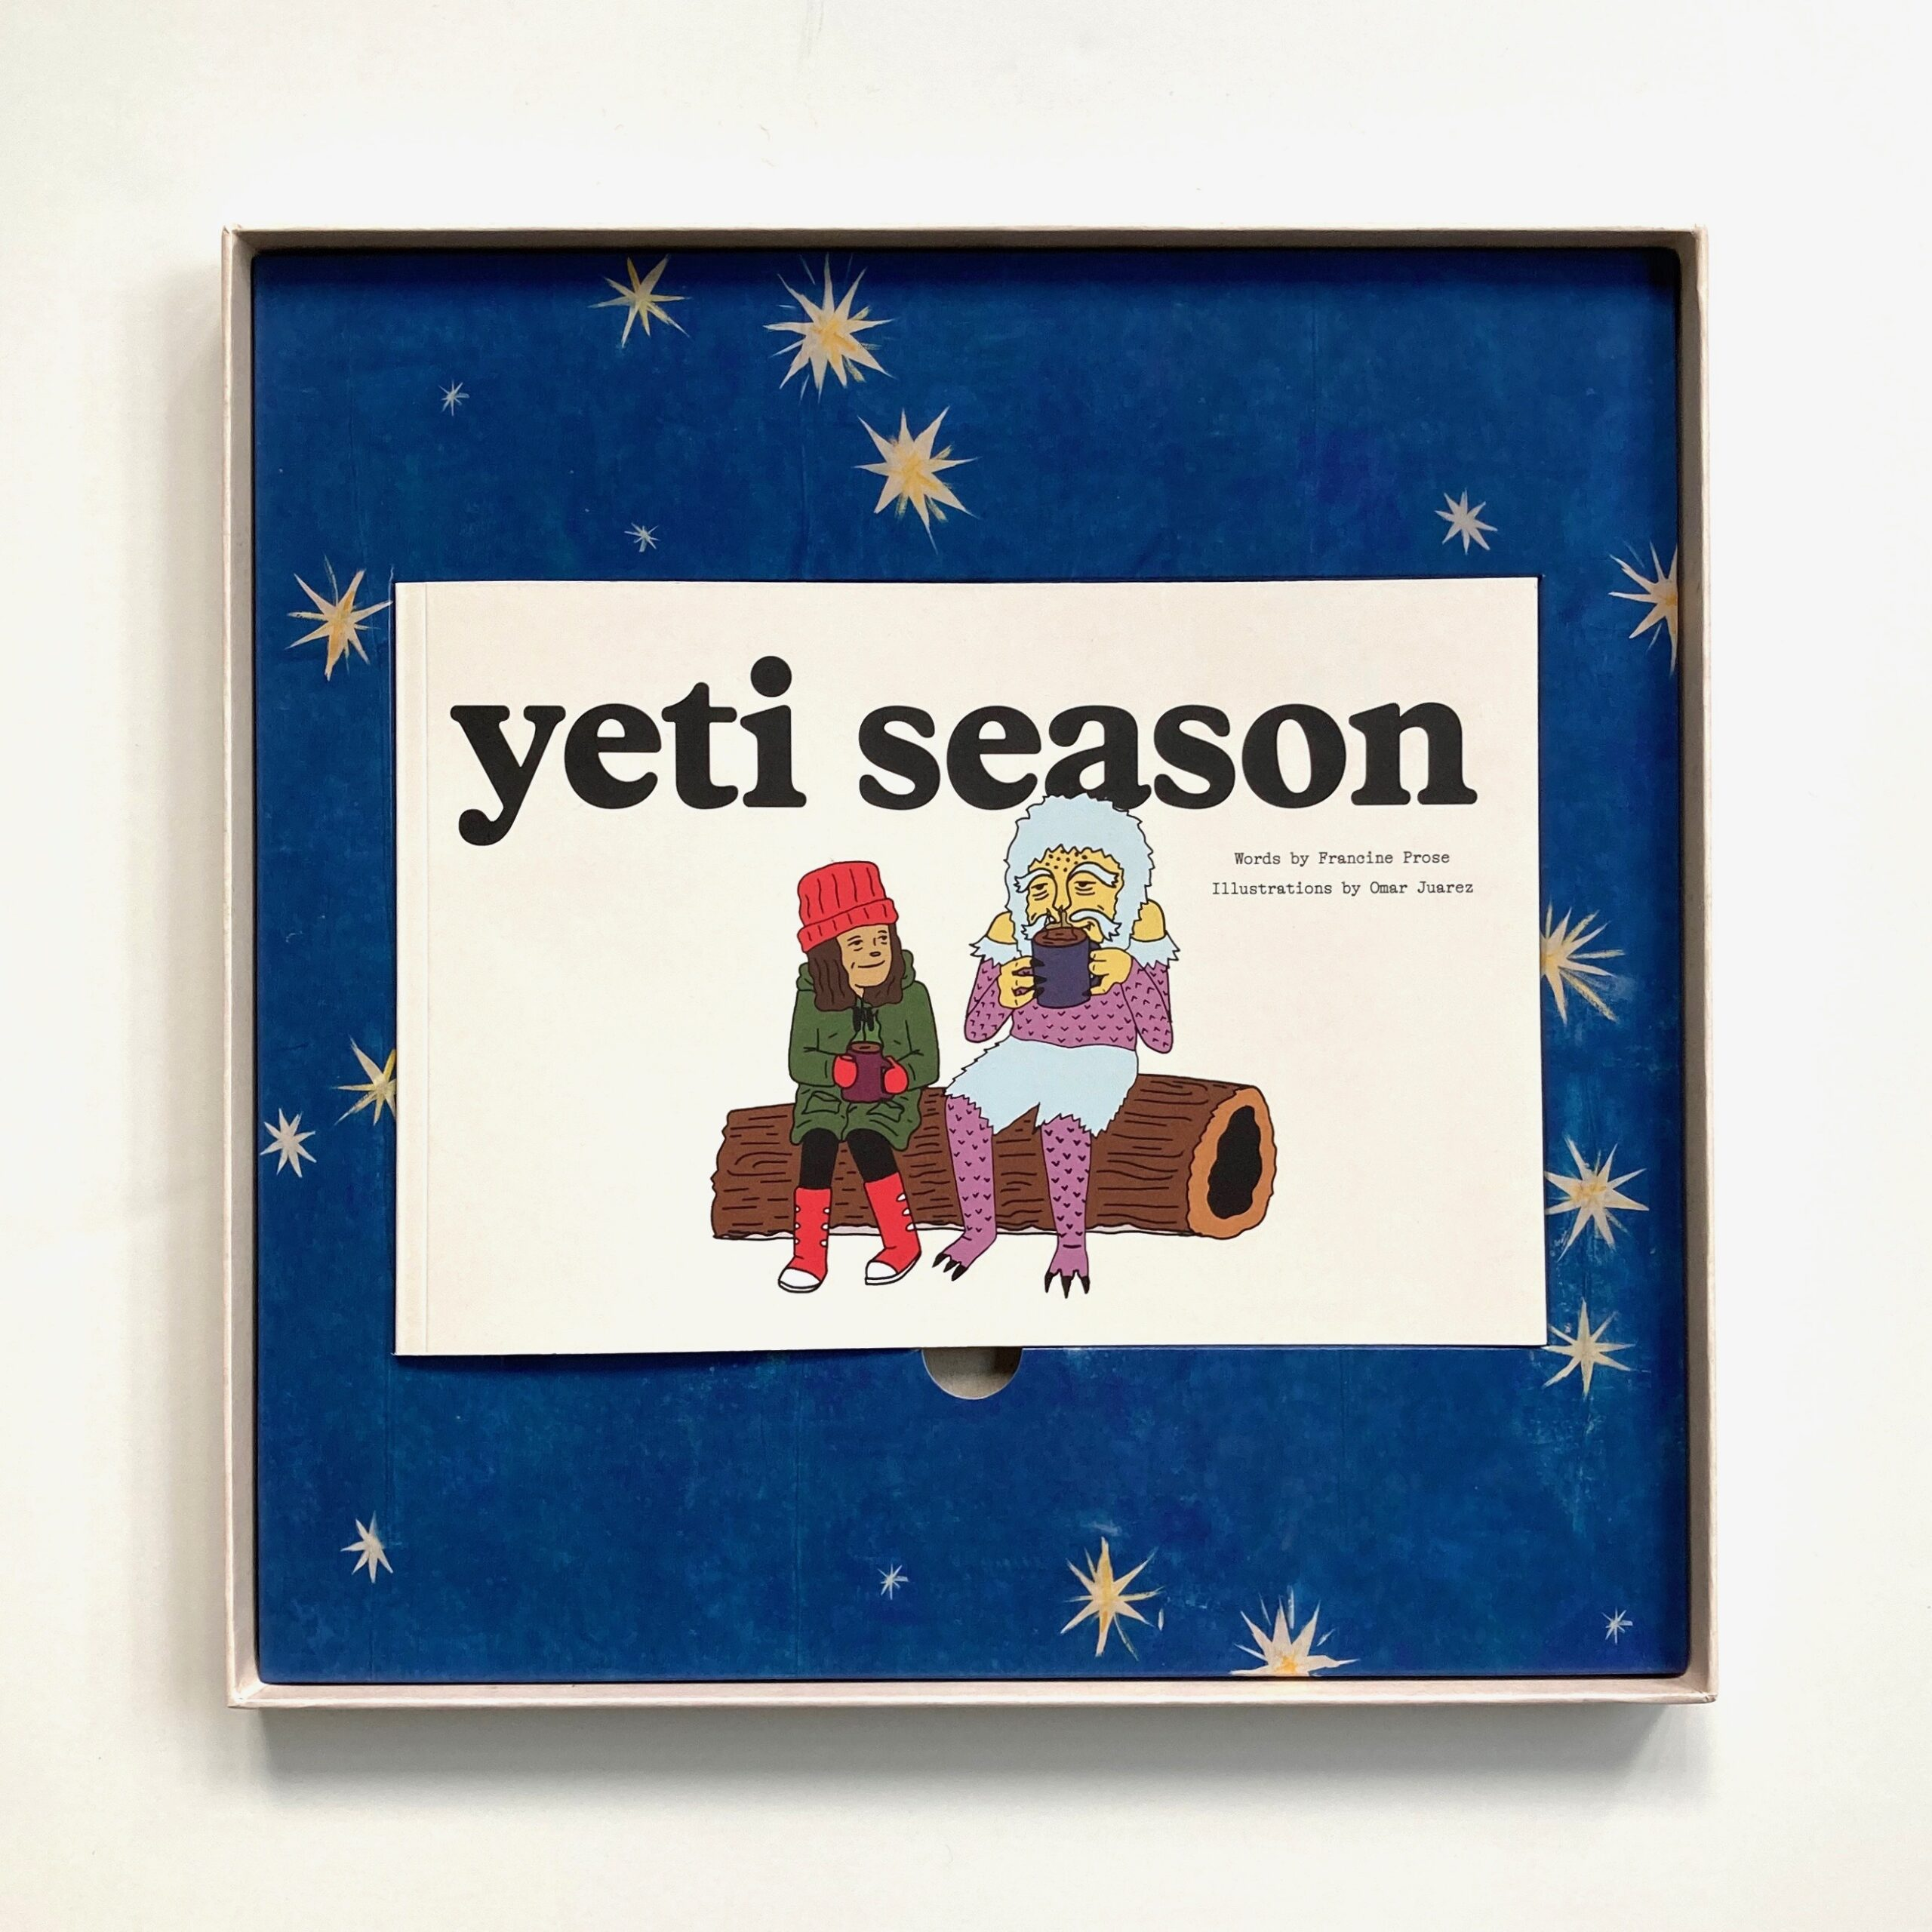 Yeti Season - Deluxe Box Set - Big Crown Records